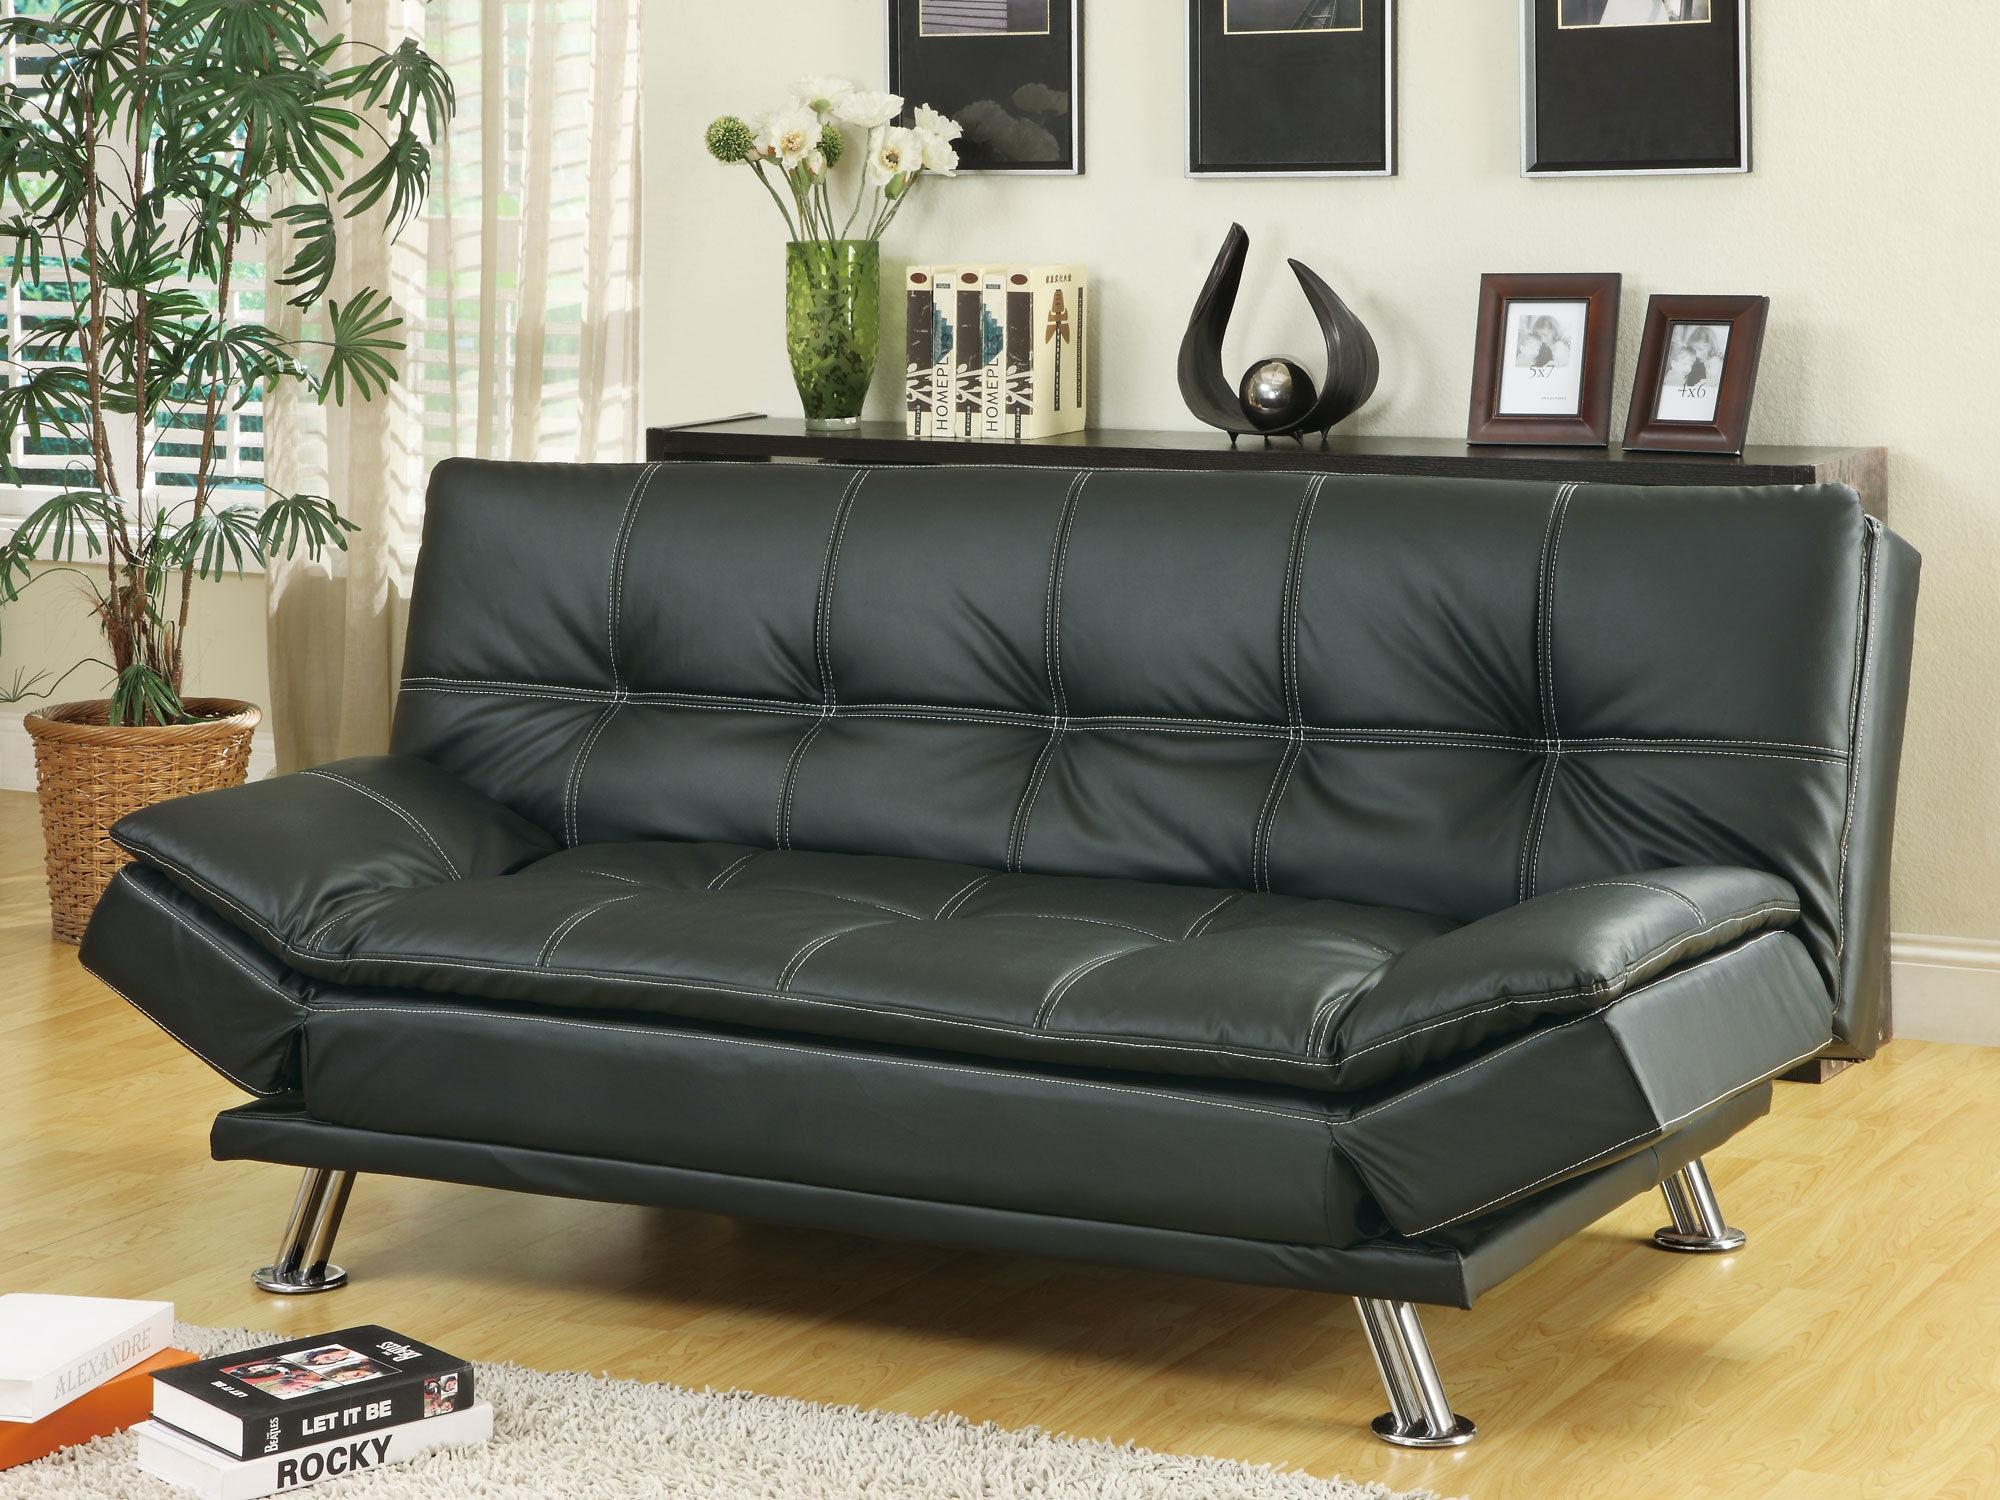 coaster living room sofa bed 300281 gallery furniture of central rh shopgalleryfurniture com